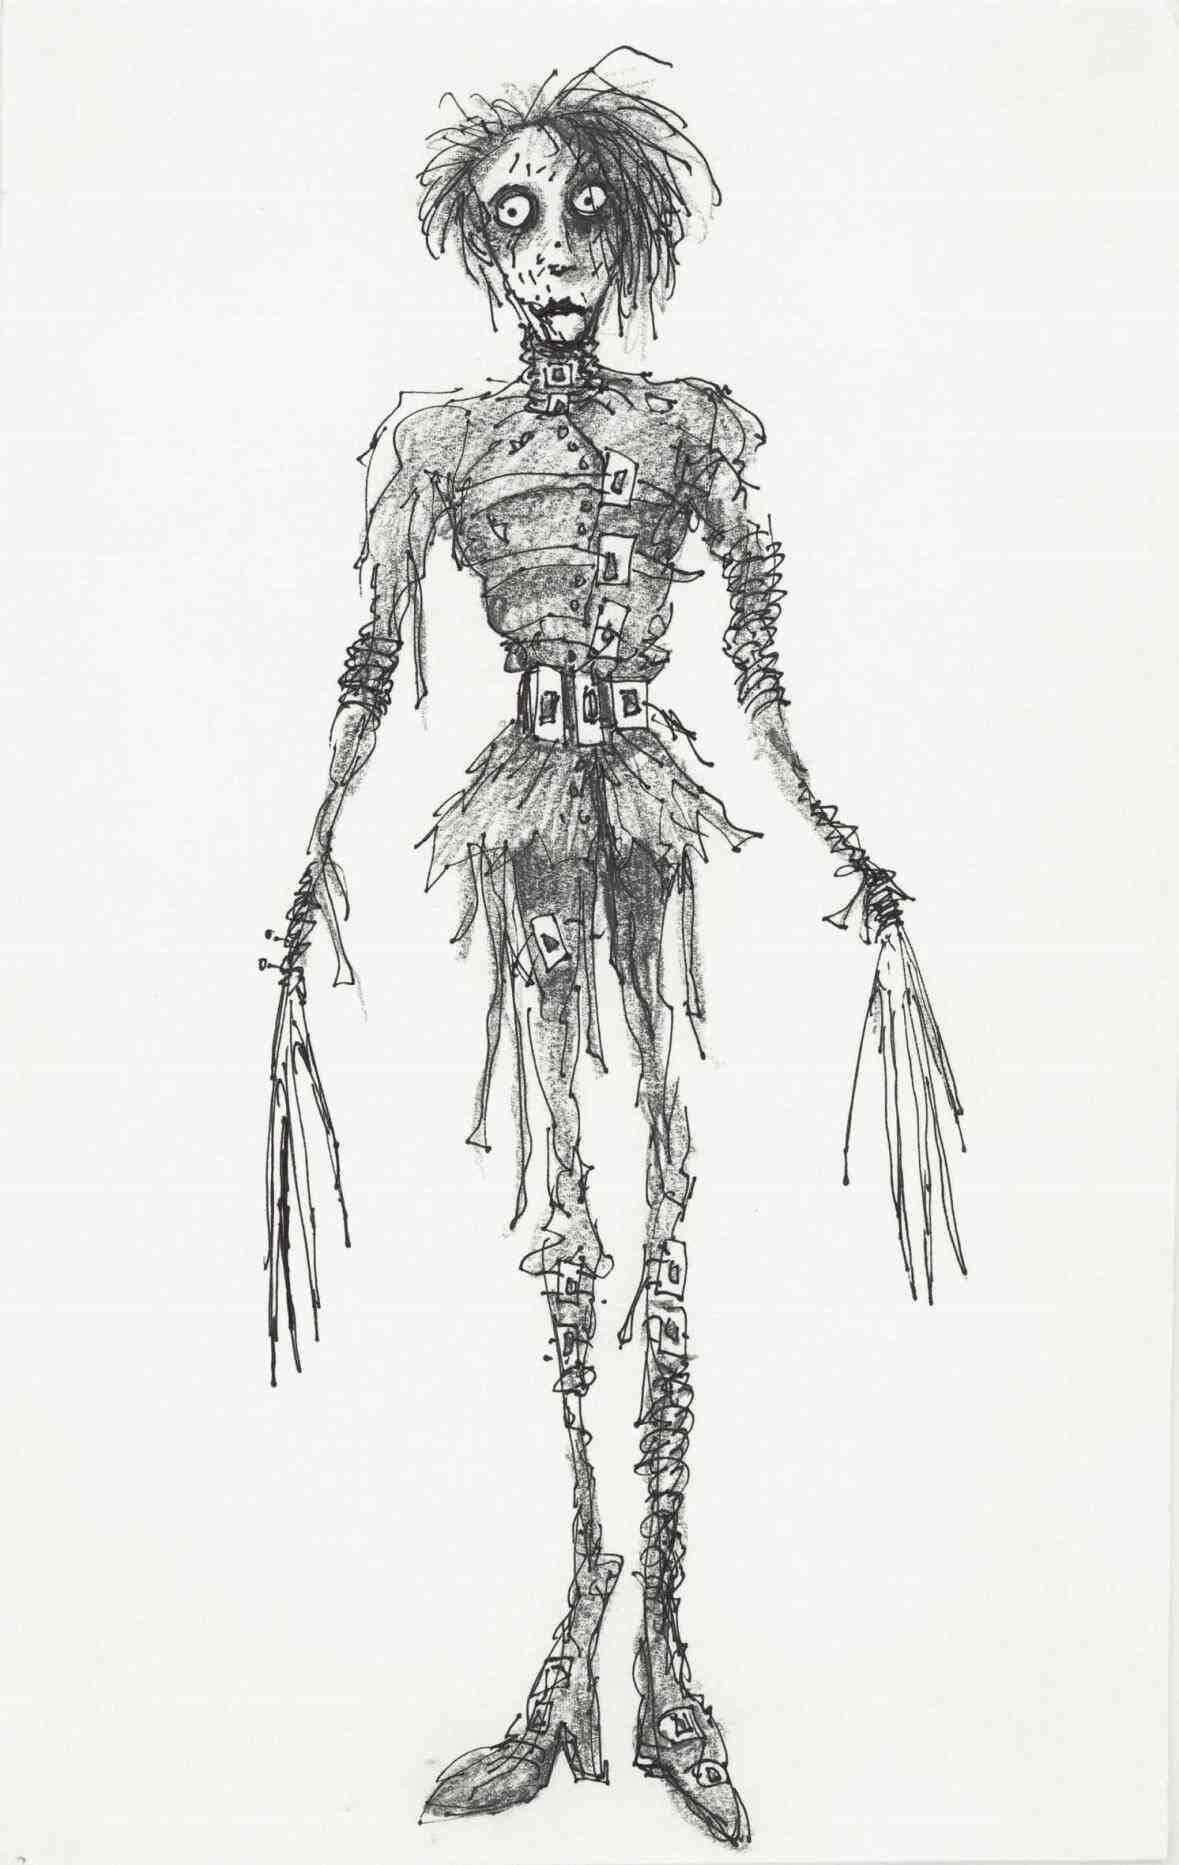 Burtonesque - Tim Burton Drawing Style of Edward Scissorhands